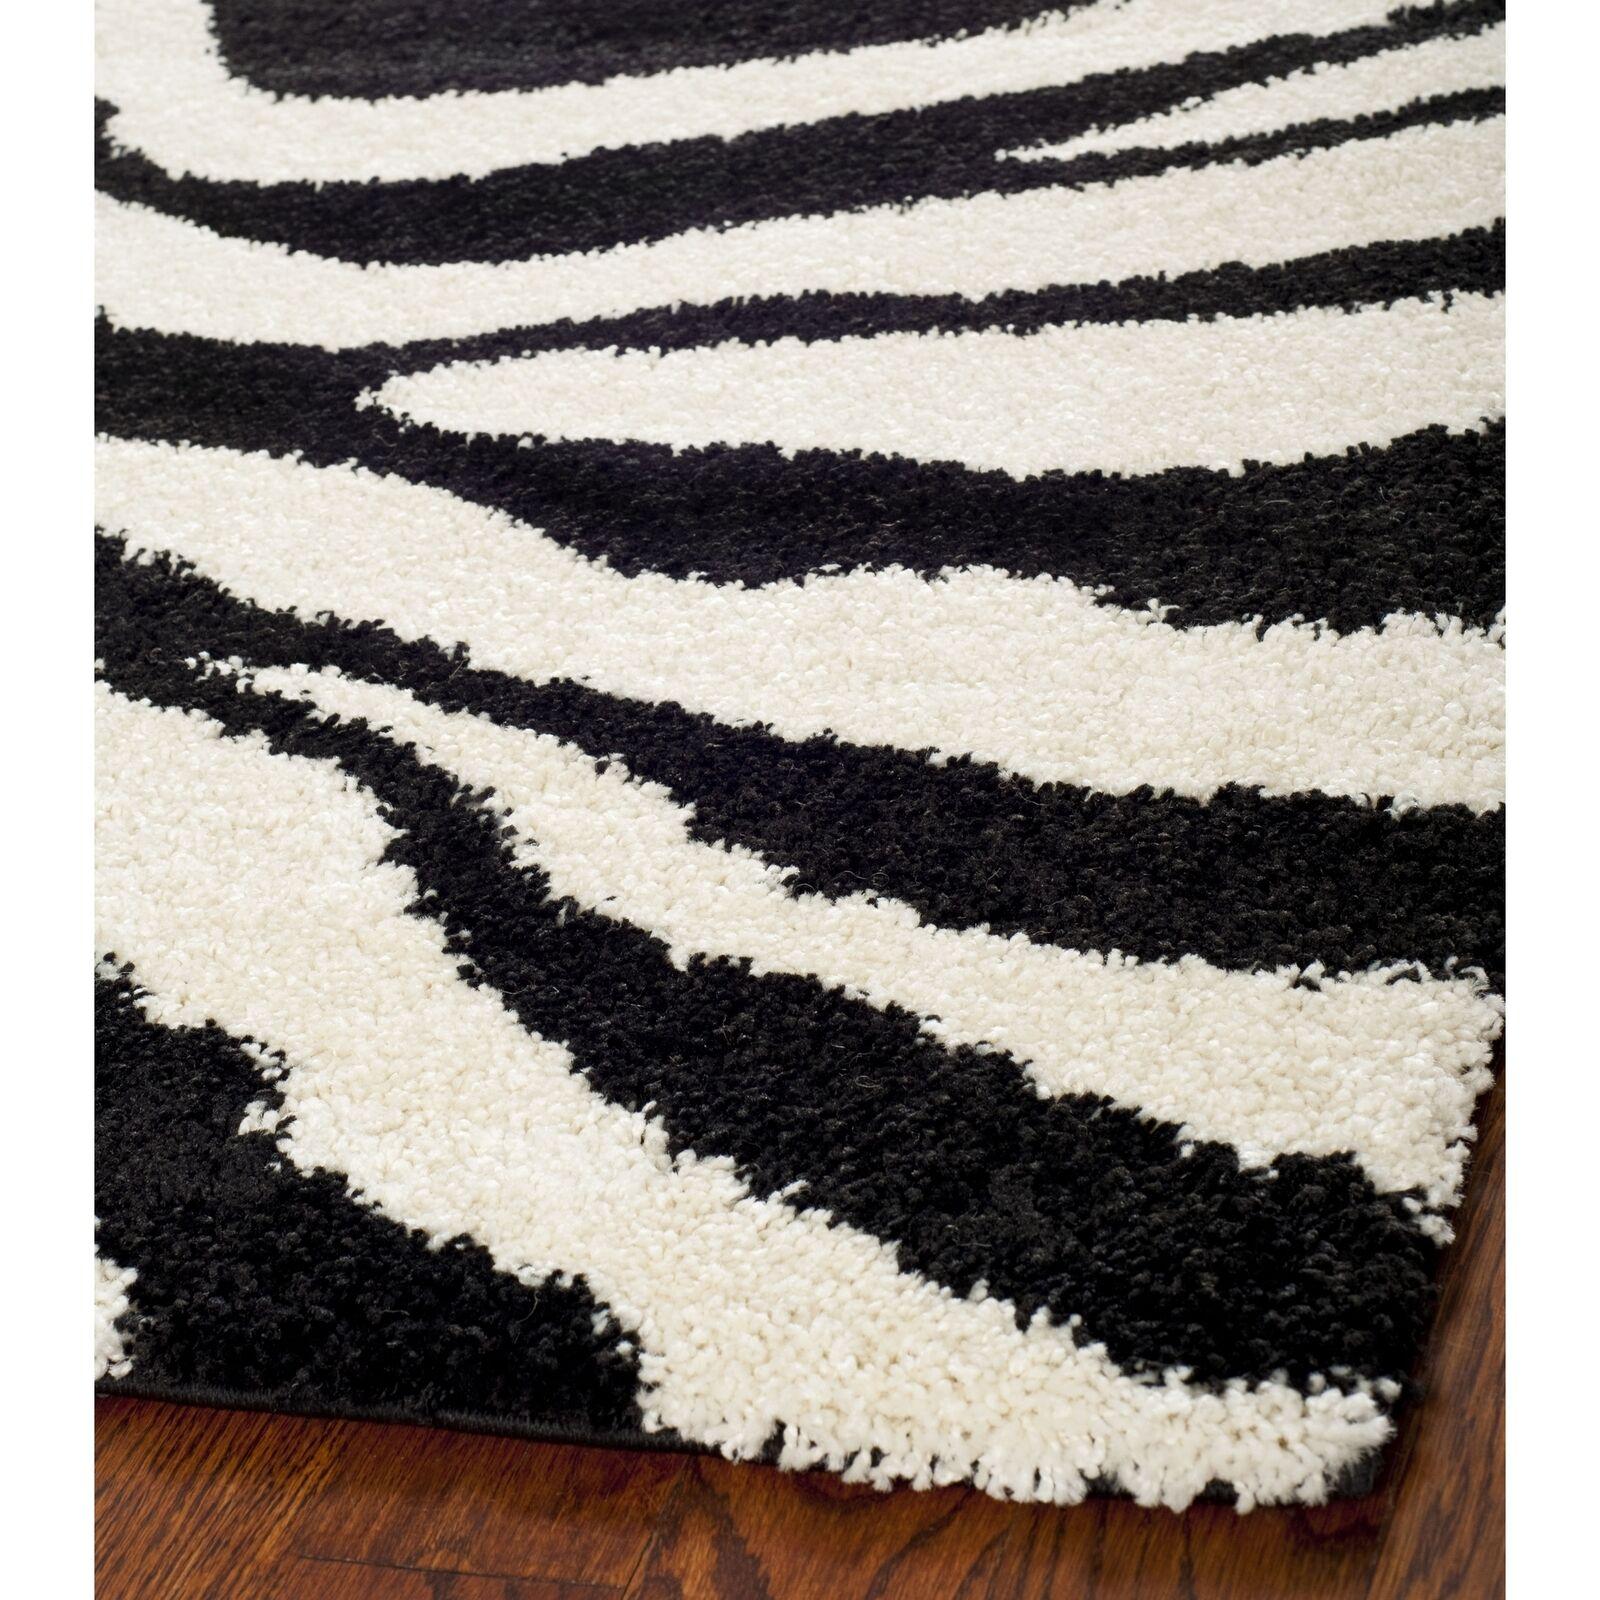 Safavieh Power Loomed Ivory Black Shag Area Rugs Sg452 1290 For Sale Online